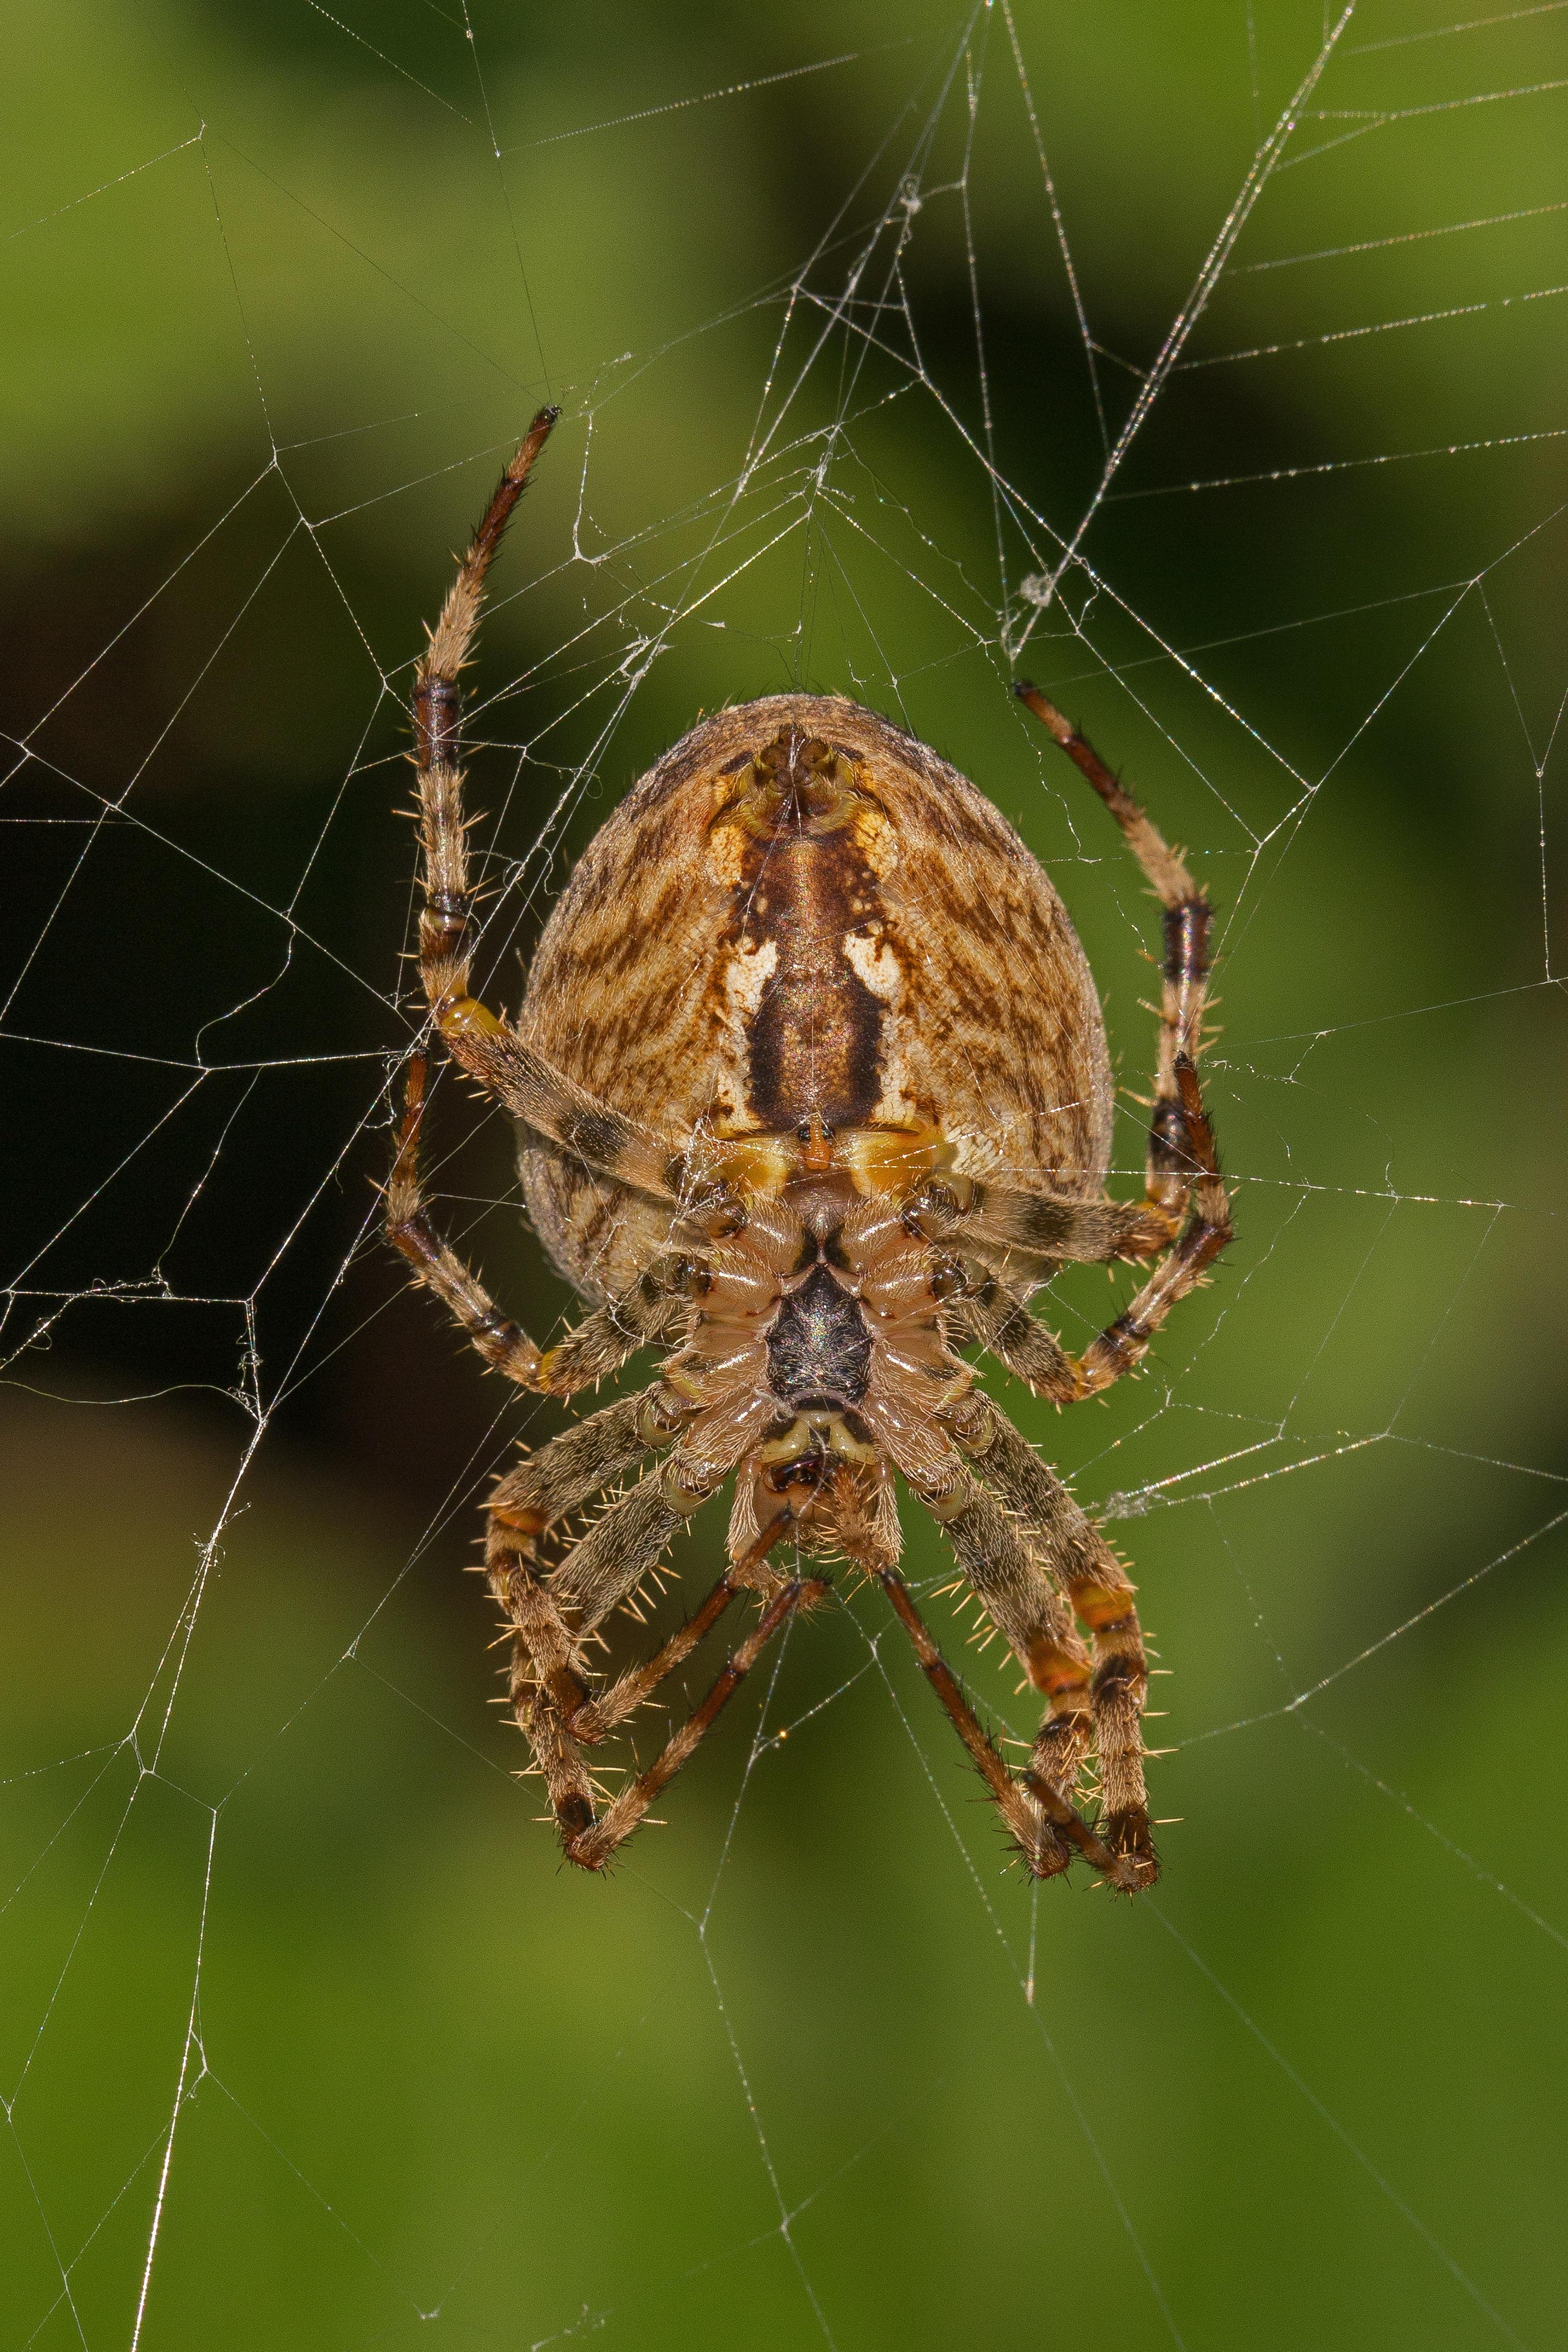 Free Images : fauna, material, invertebrate, spider web, cobweb ...